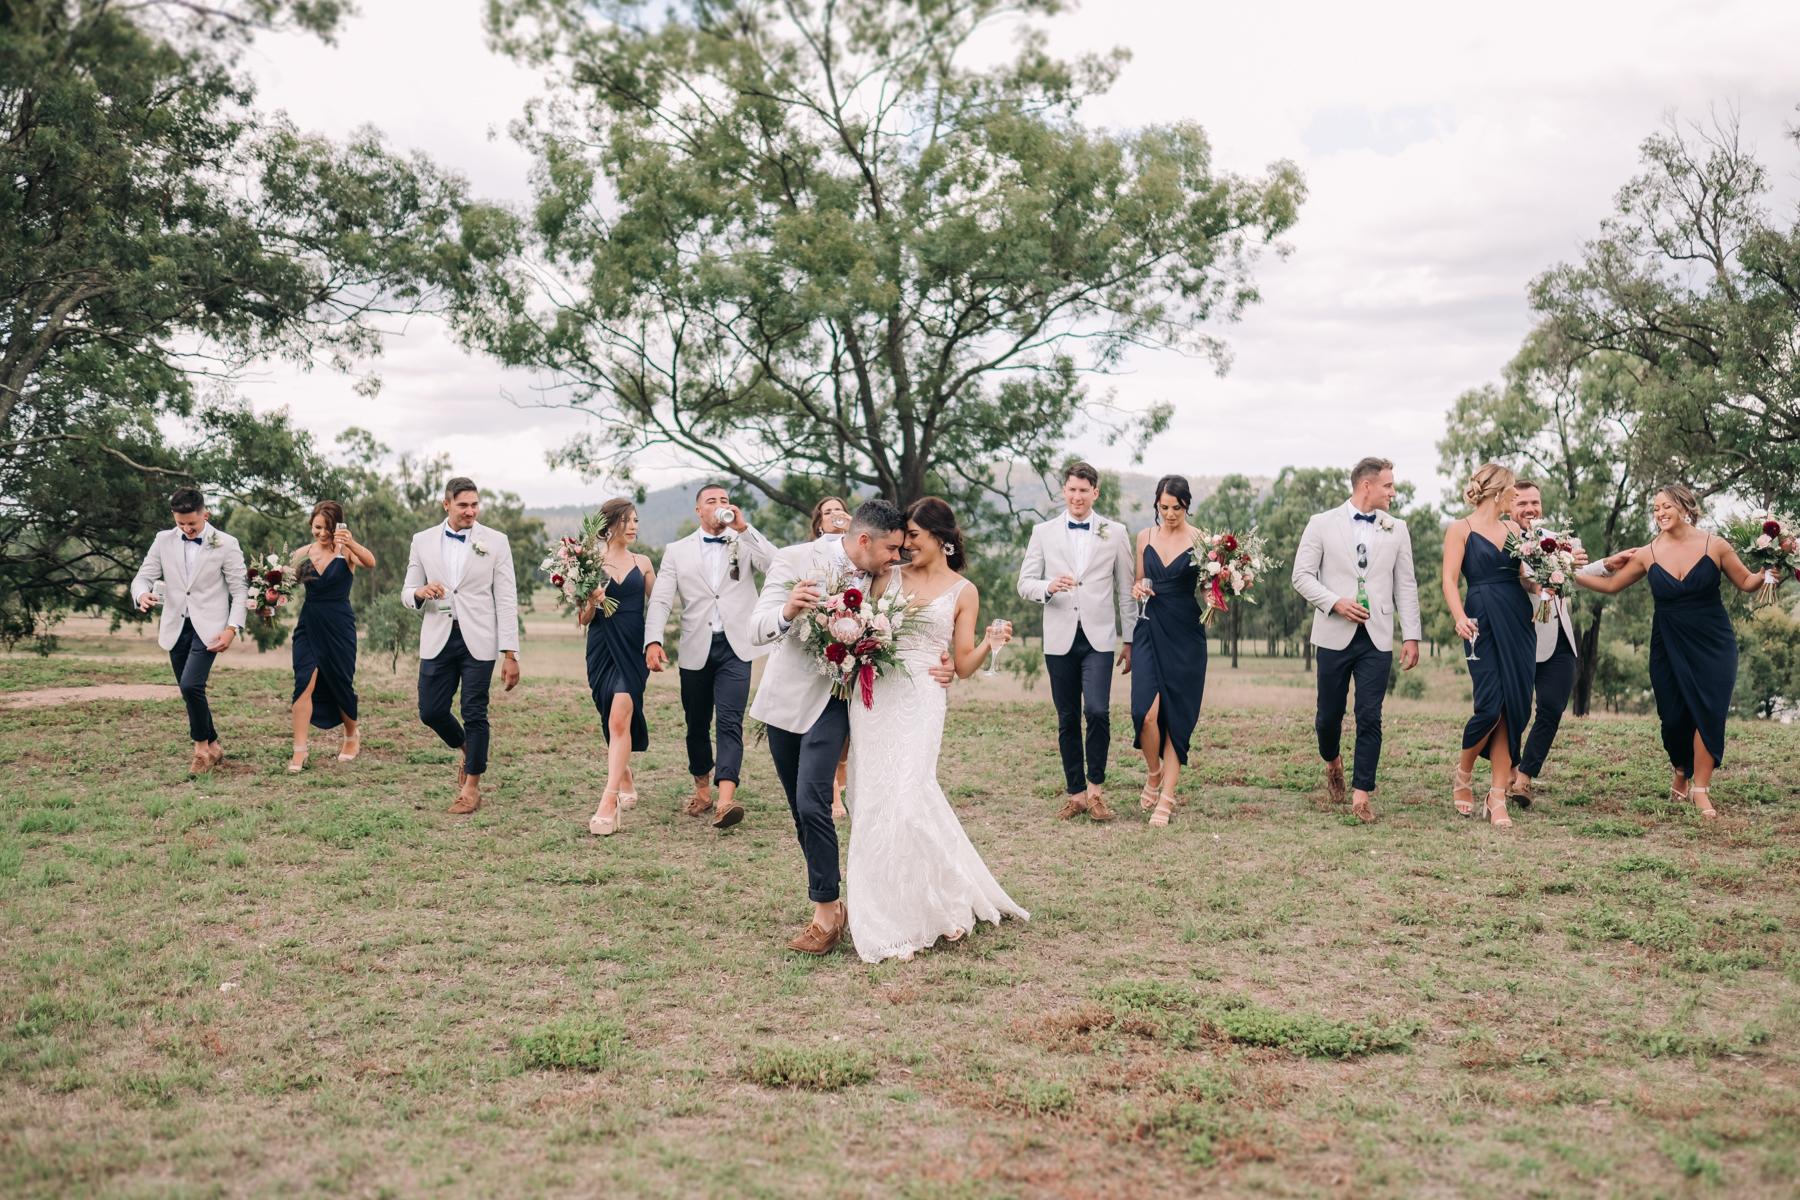 Adams Peak Wedding Photos 001.jpg